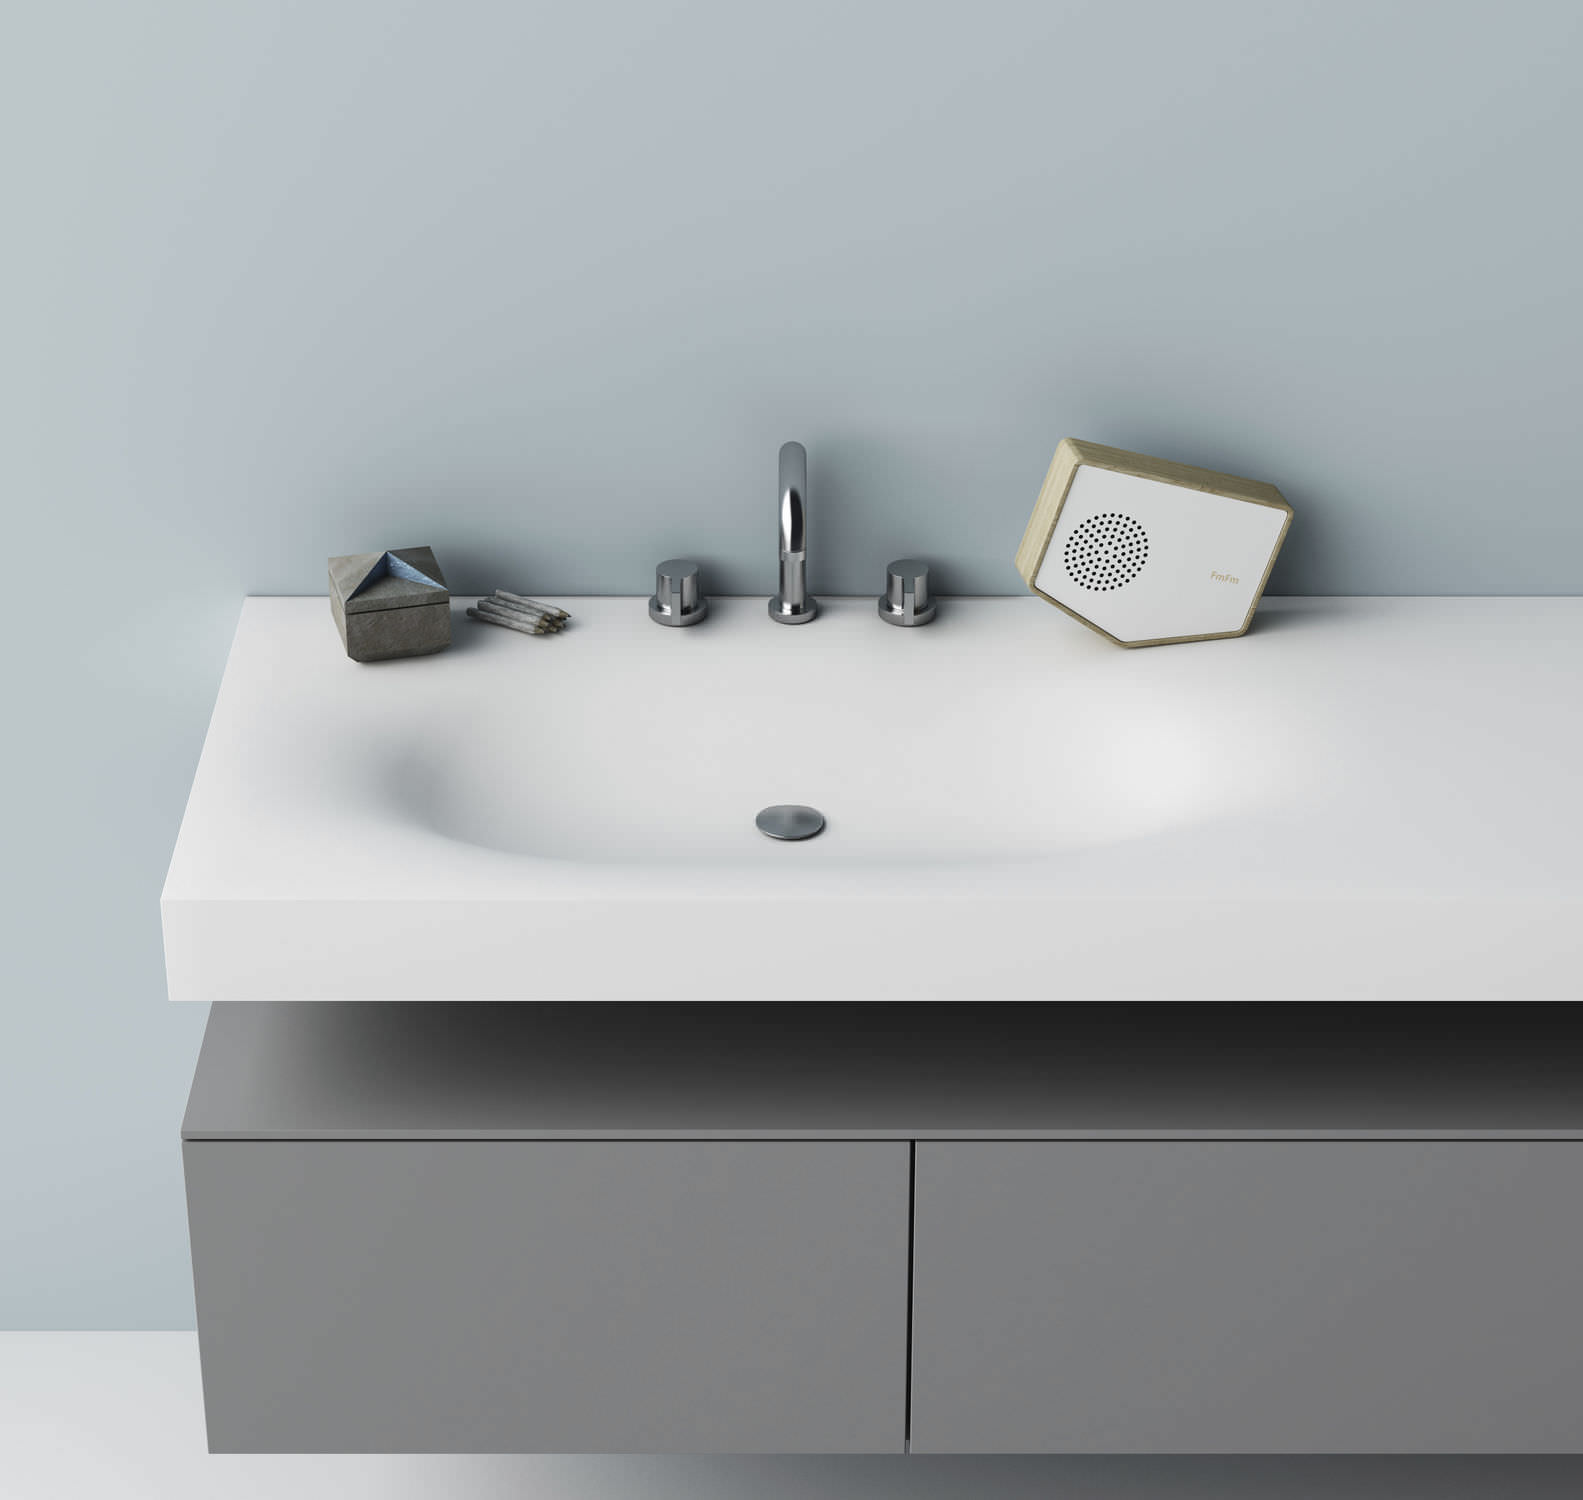 Wall Mounted Washbasin Rectangular Corian Contemporary Moby